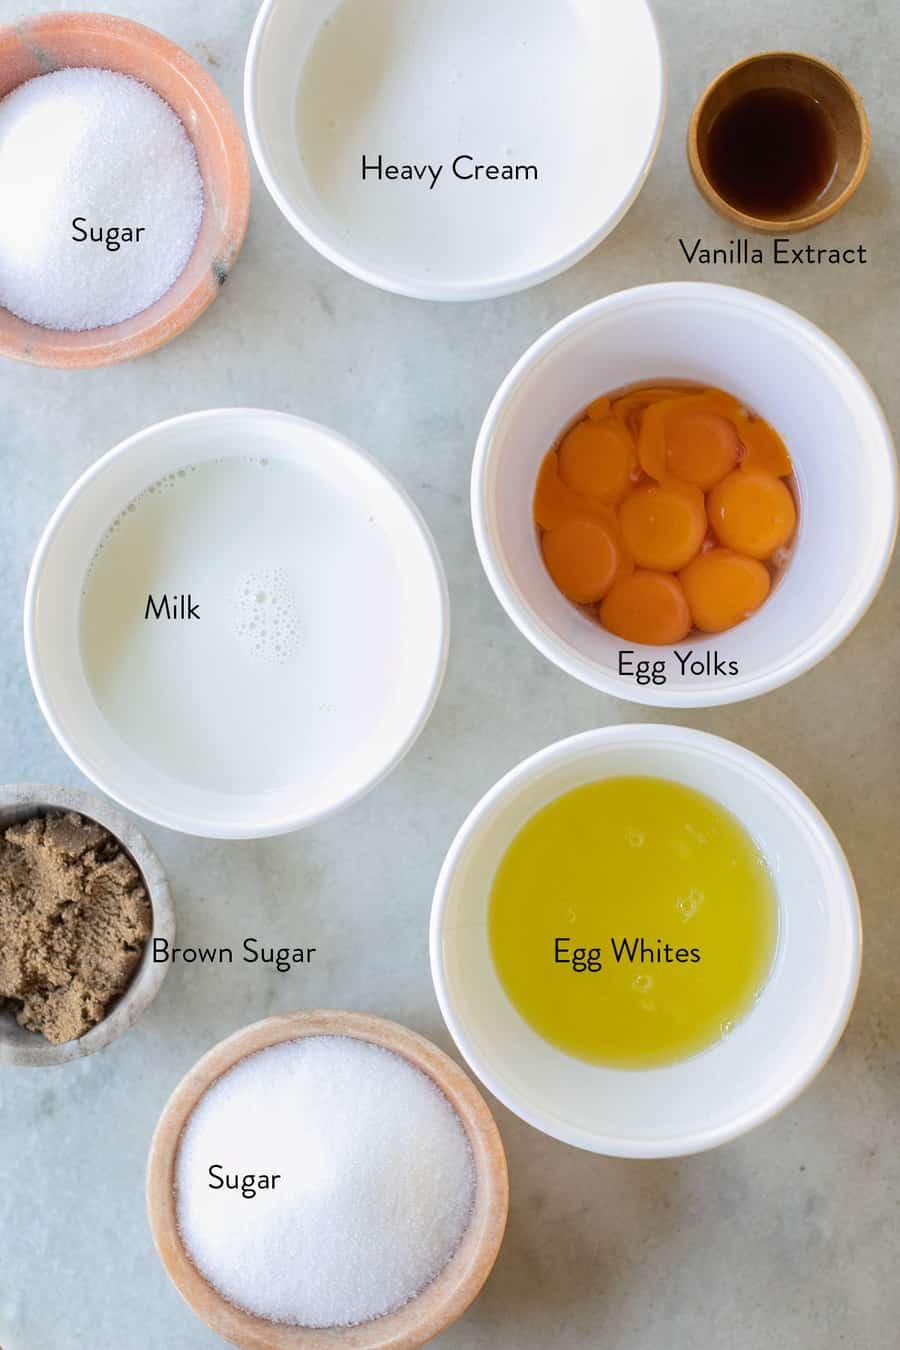 Ingredients to make eggnog